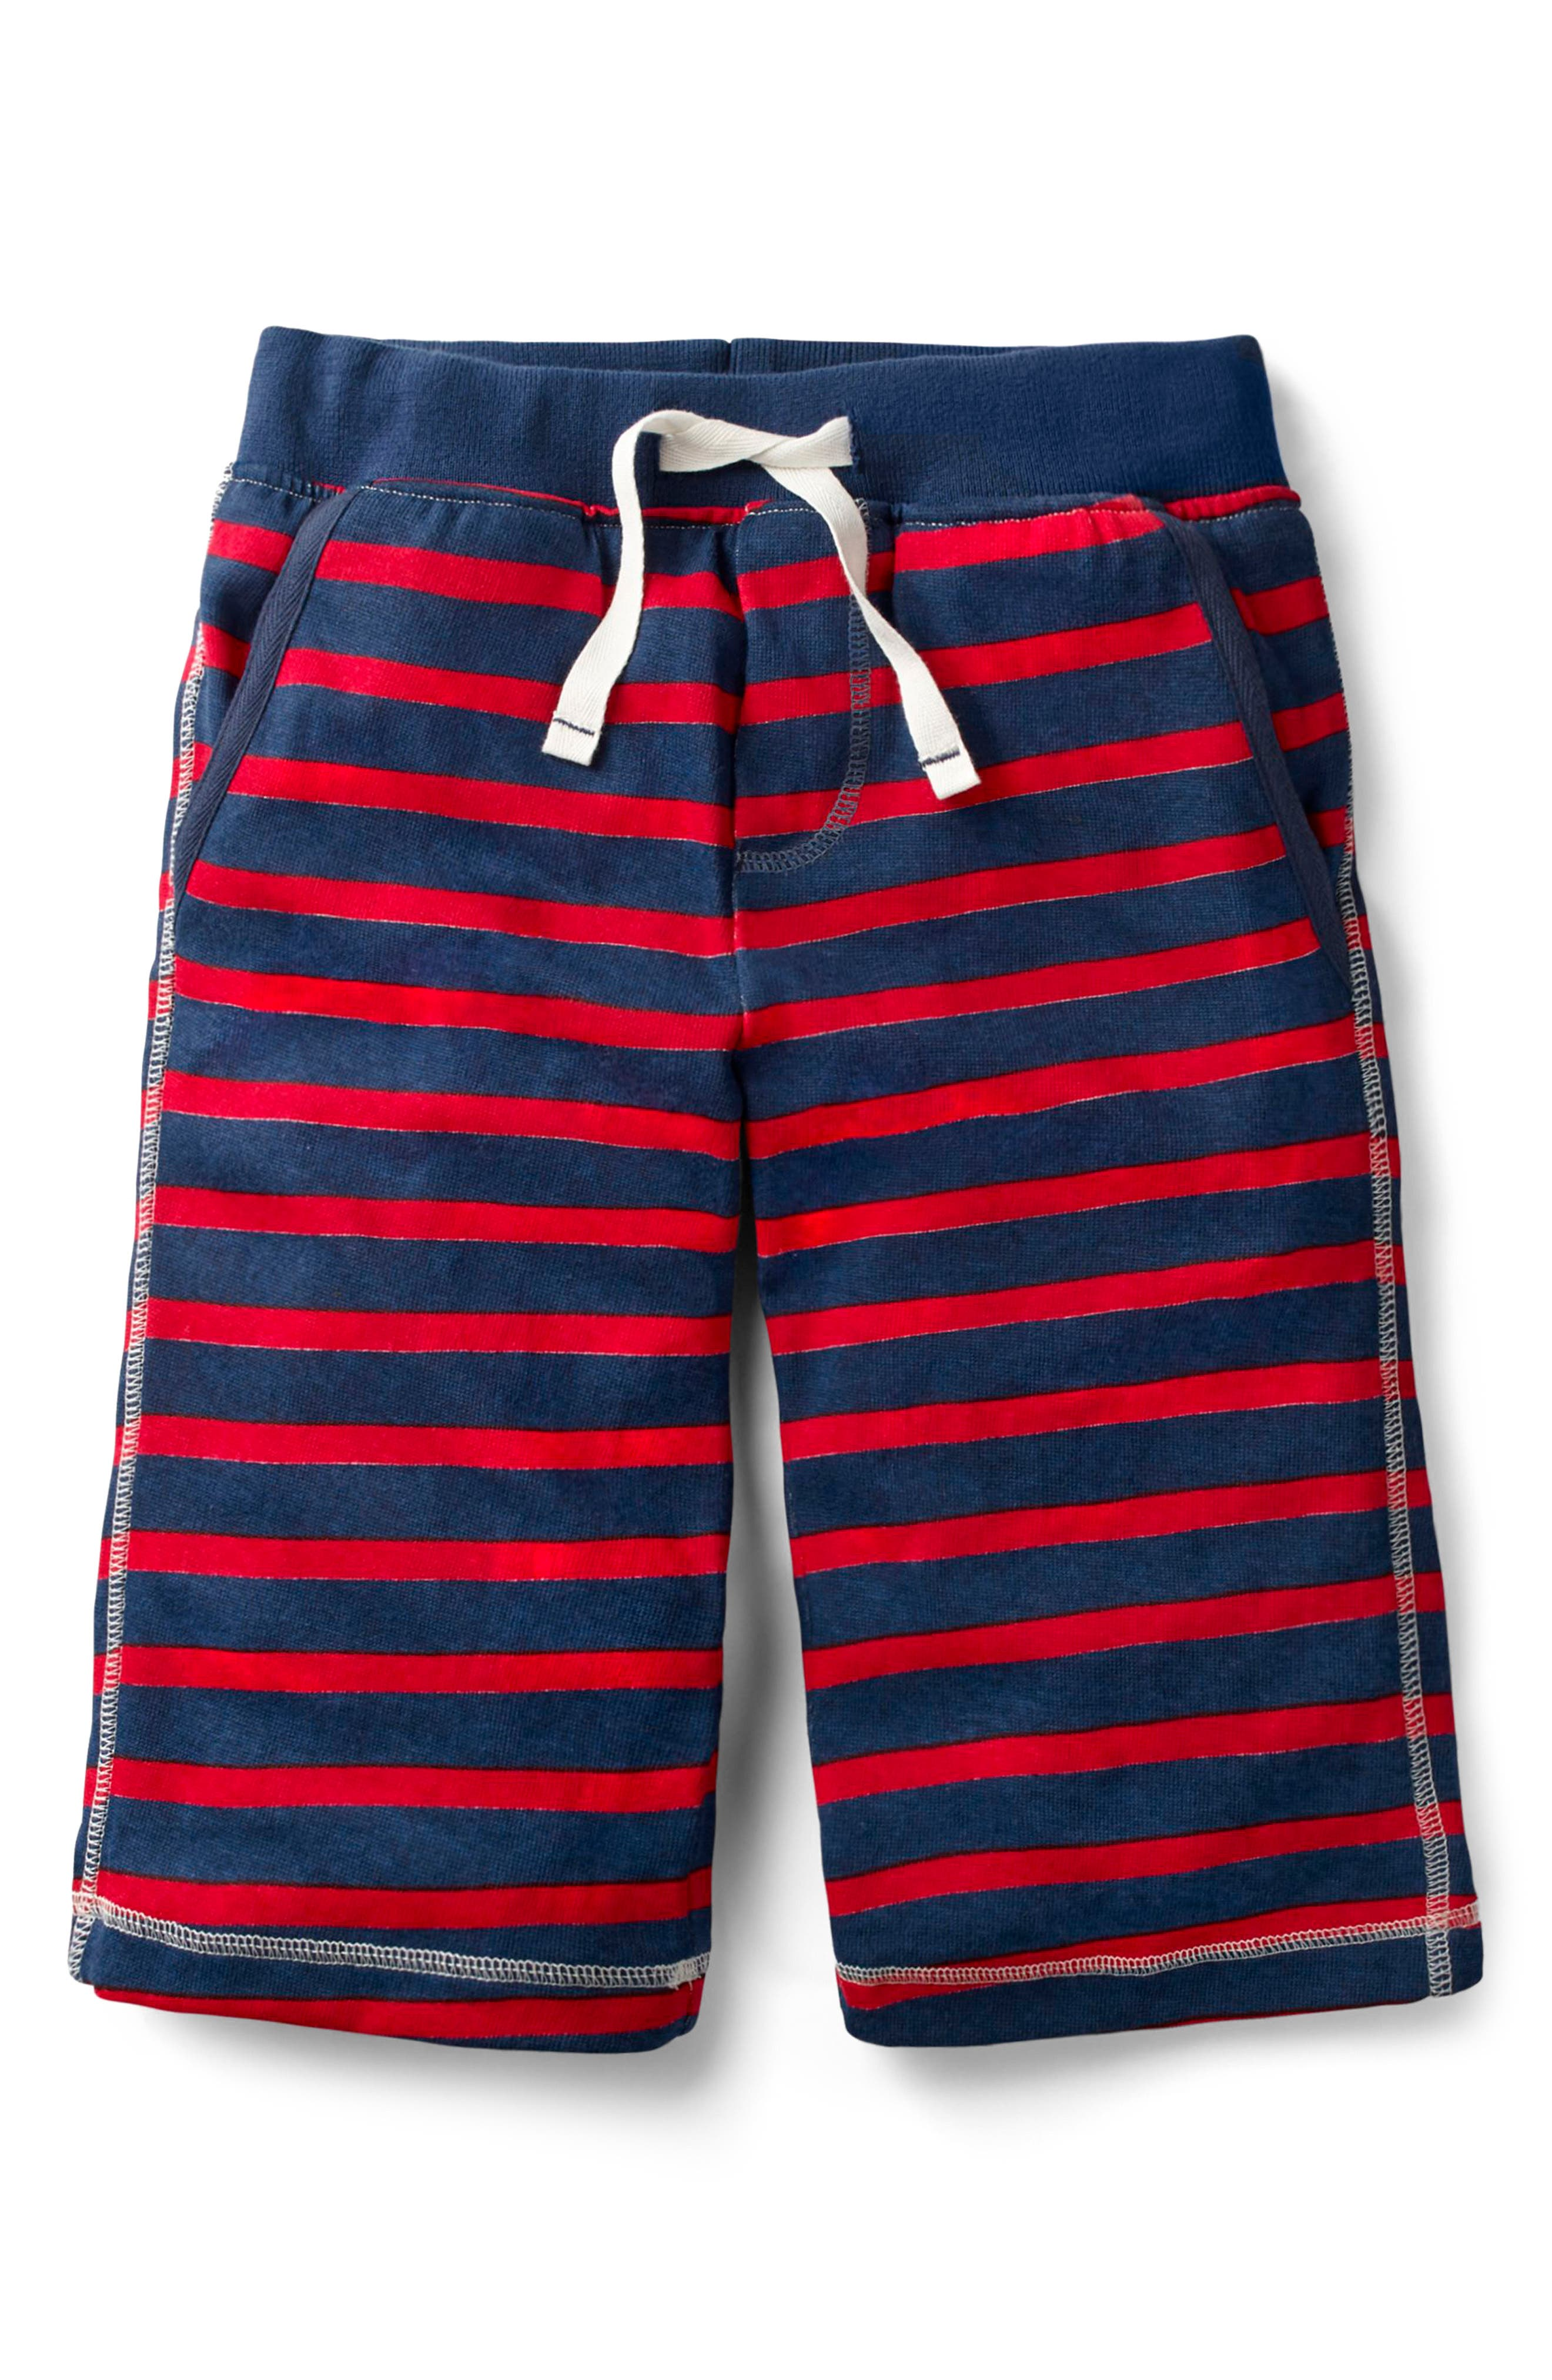 Jersey Baggies Shorts,                             Main thumbnail 1, color,                             Beacon Blue/ Salsa Red